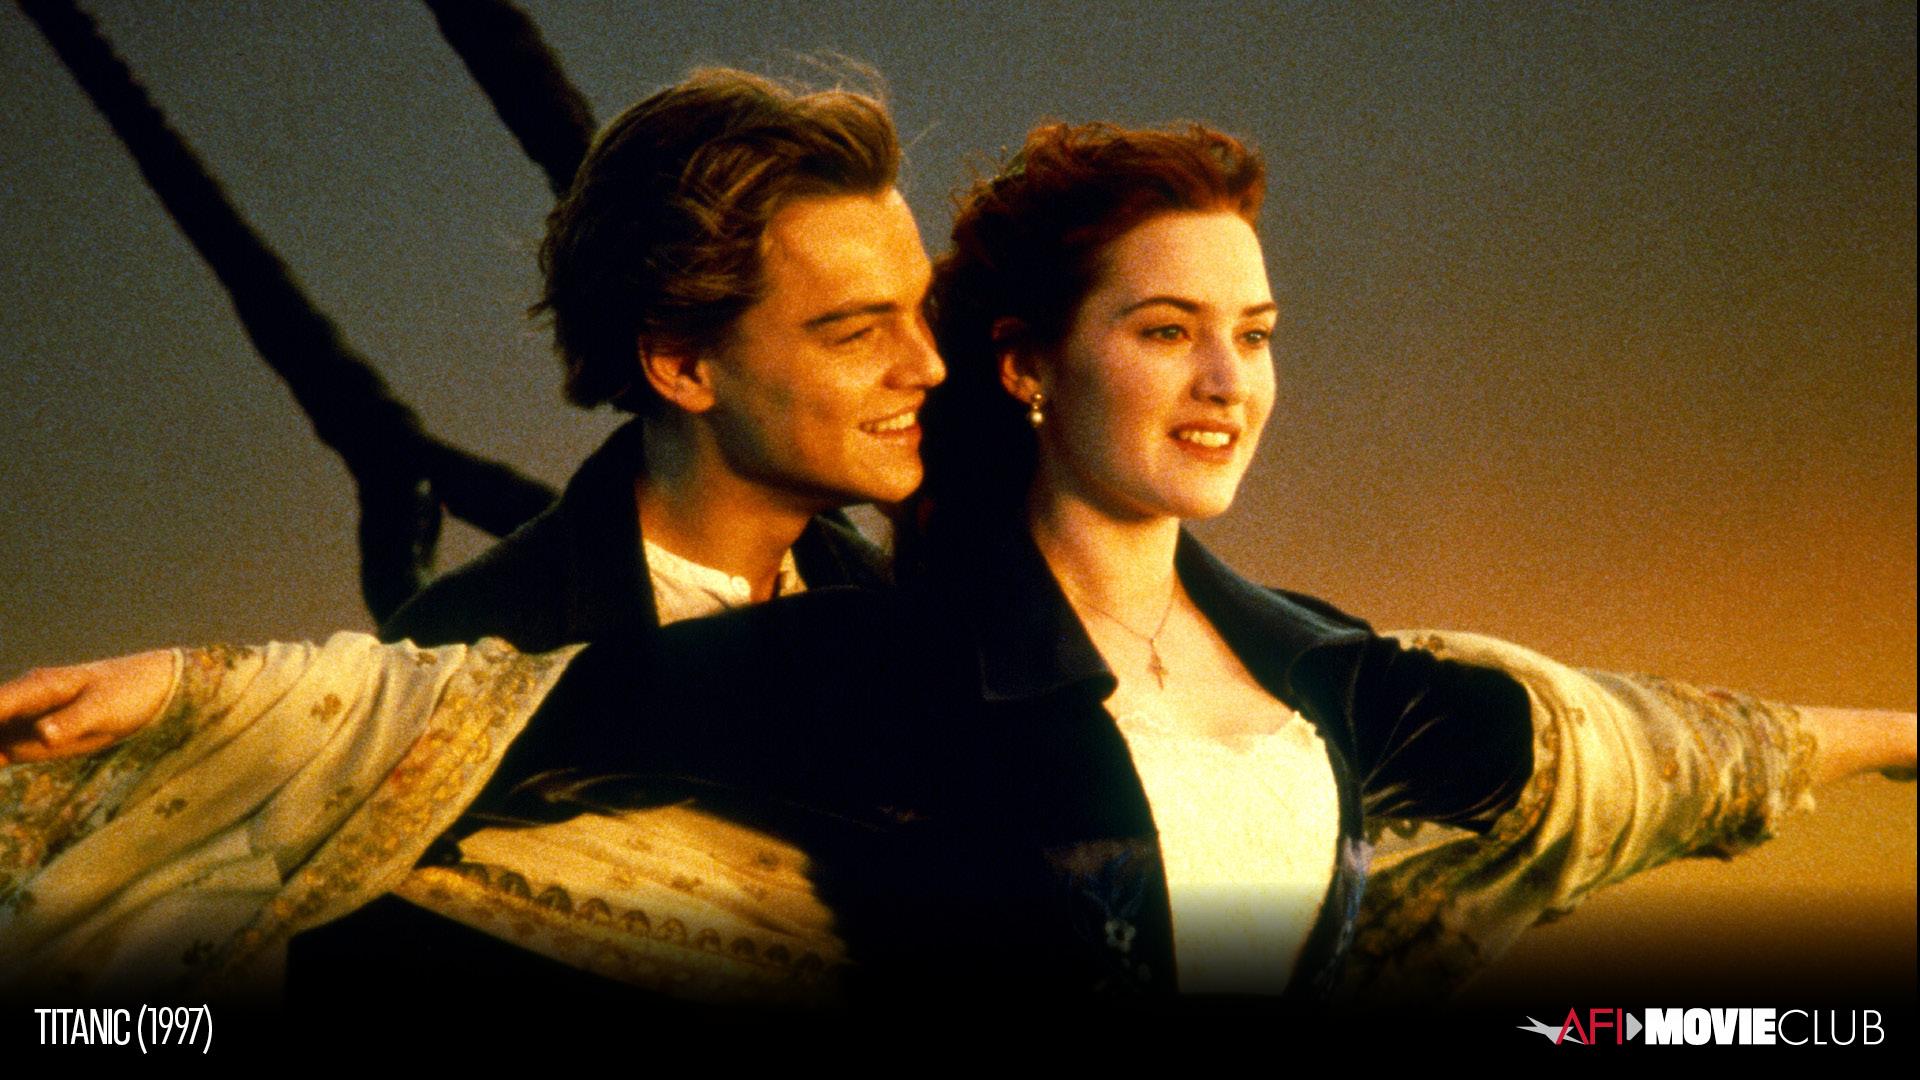 AFI Movie Club: TITANIC | American Film Institute